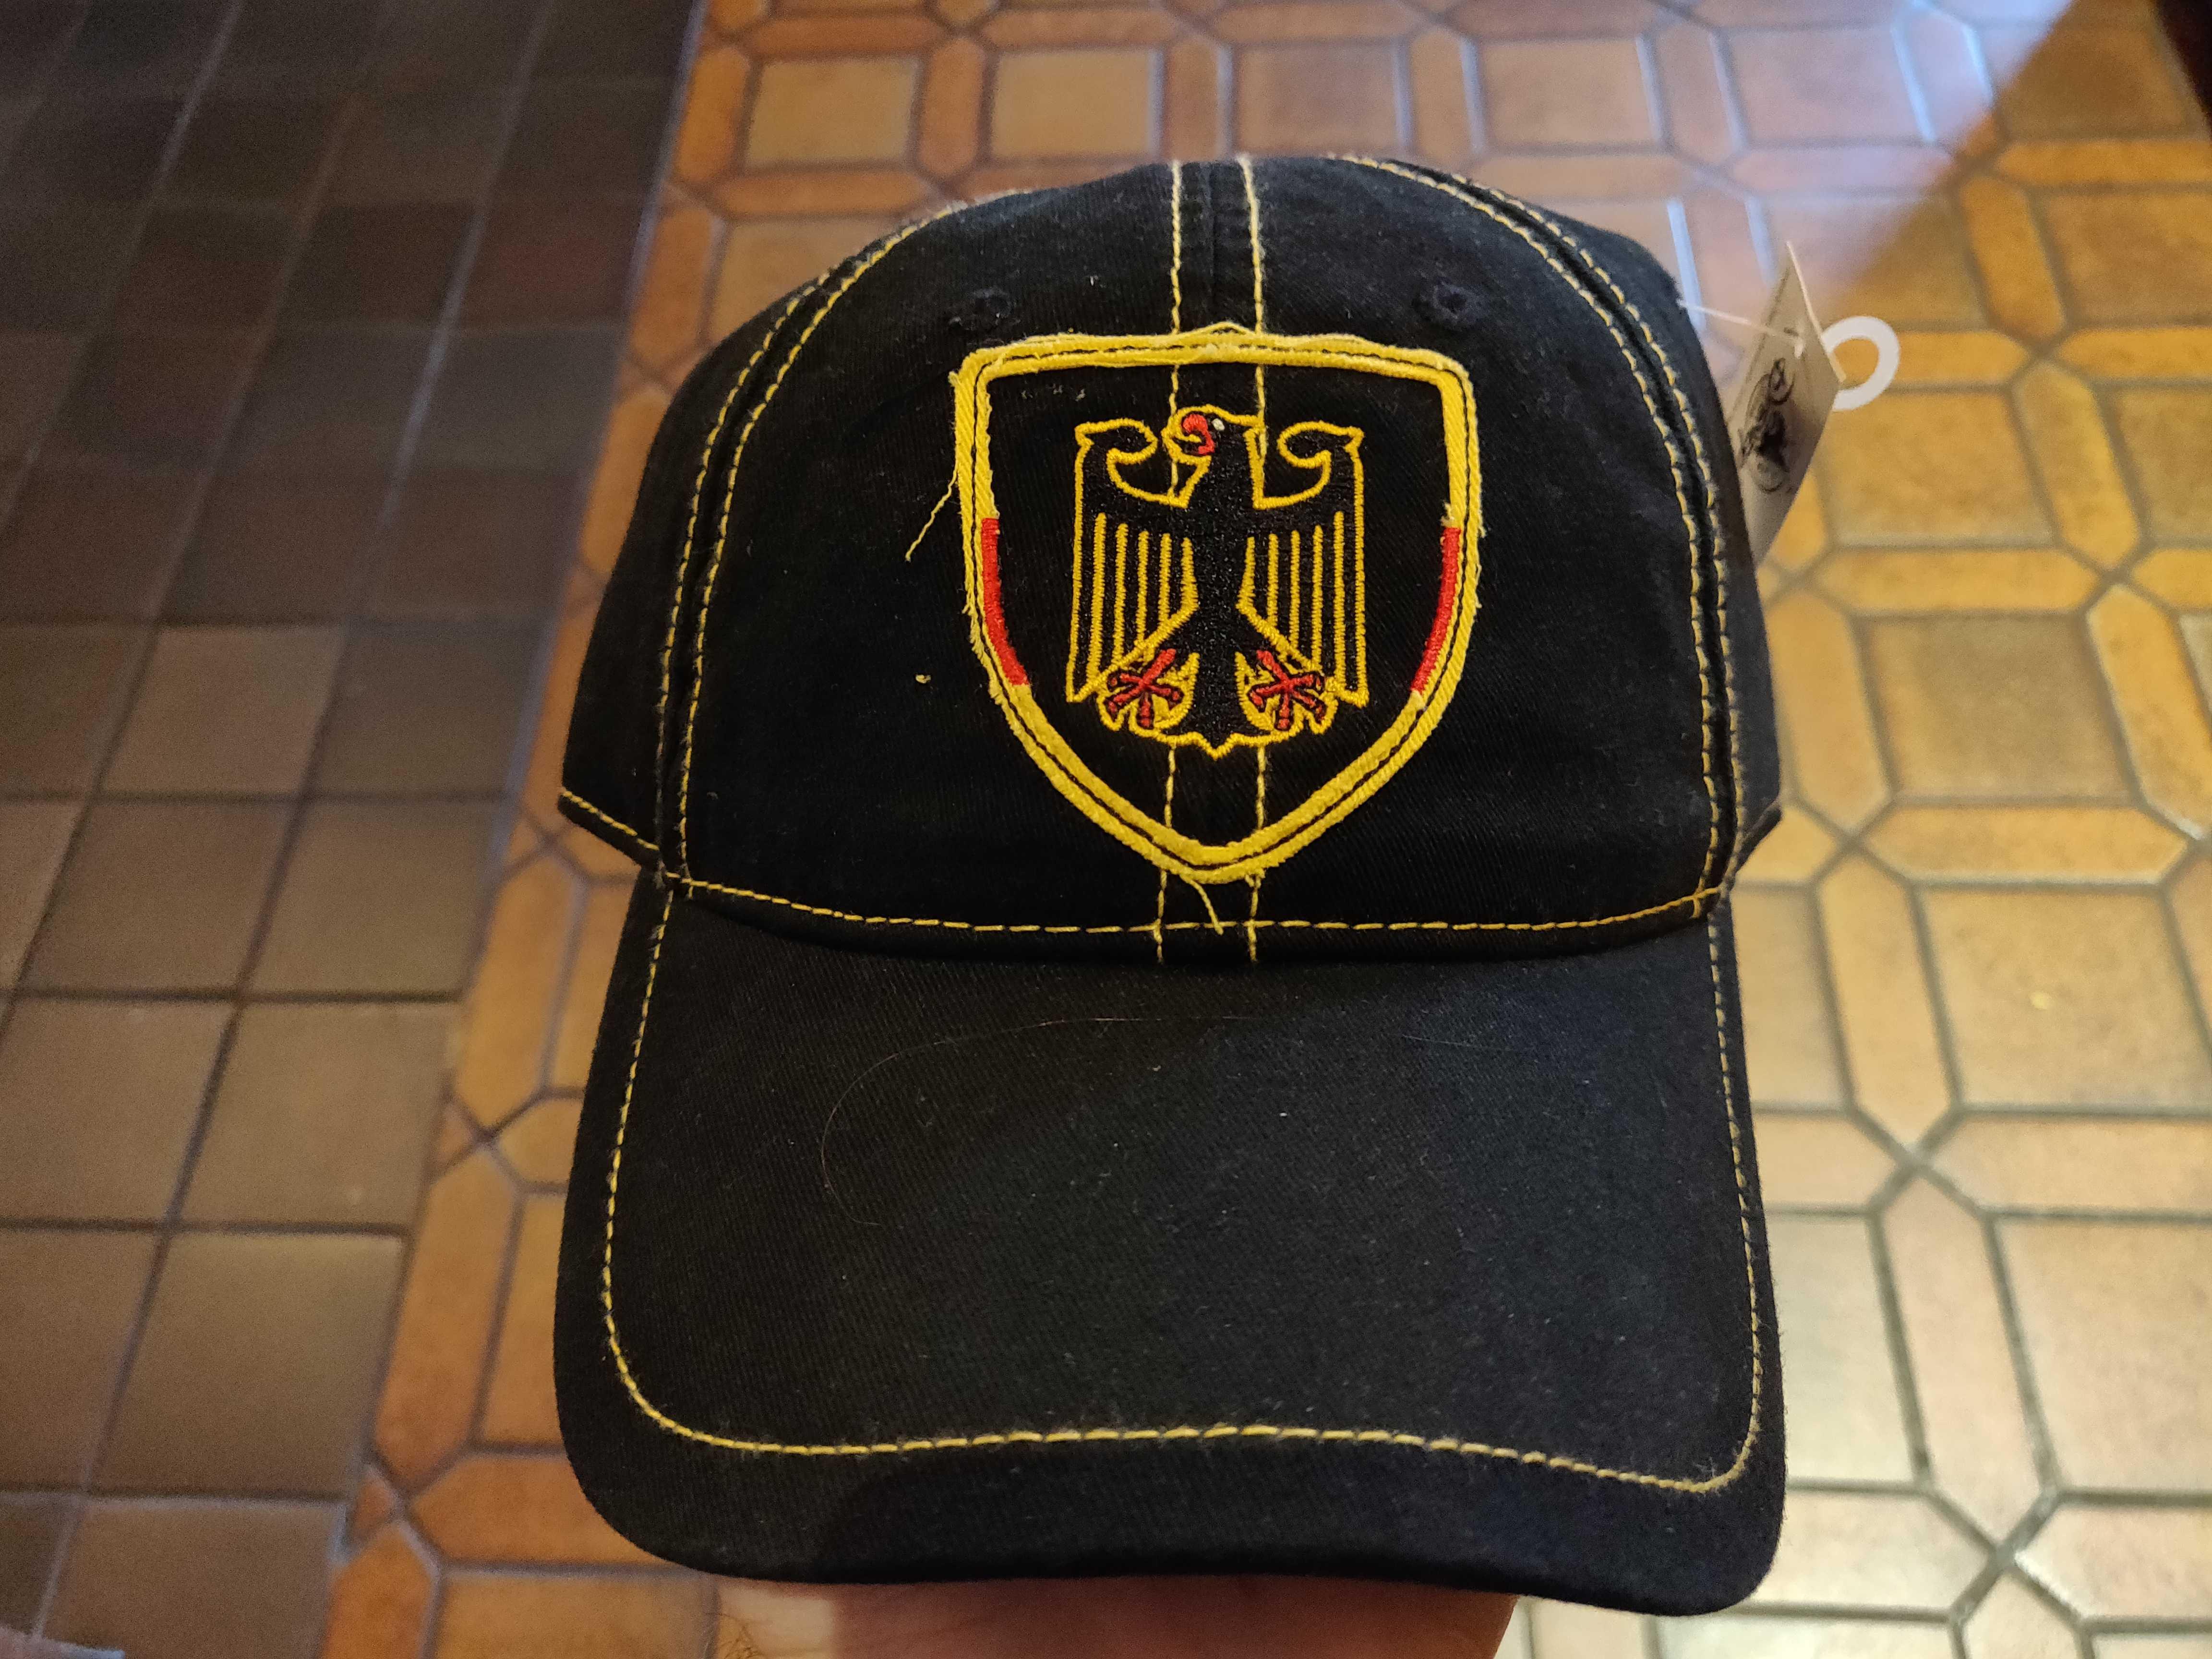 germany-epcot-merchandise-02-15-2020-28.jpg